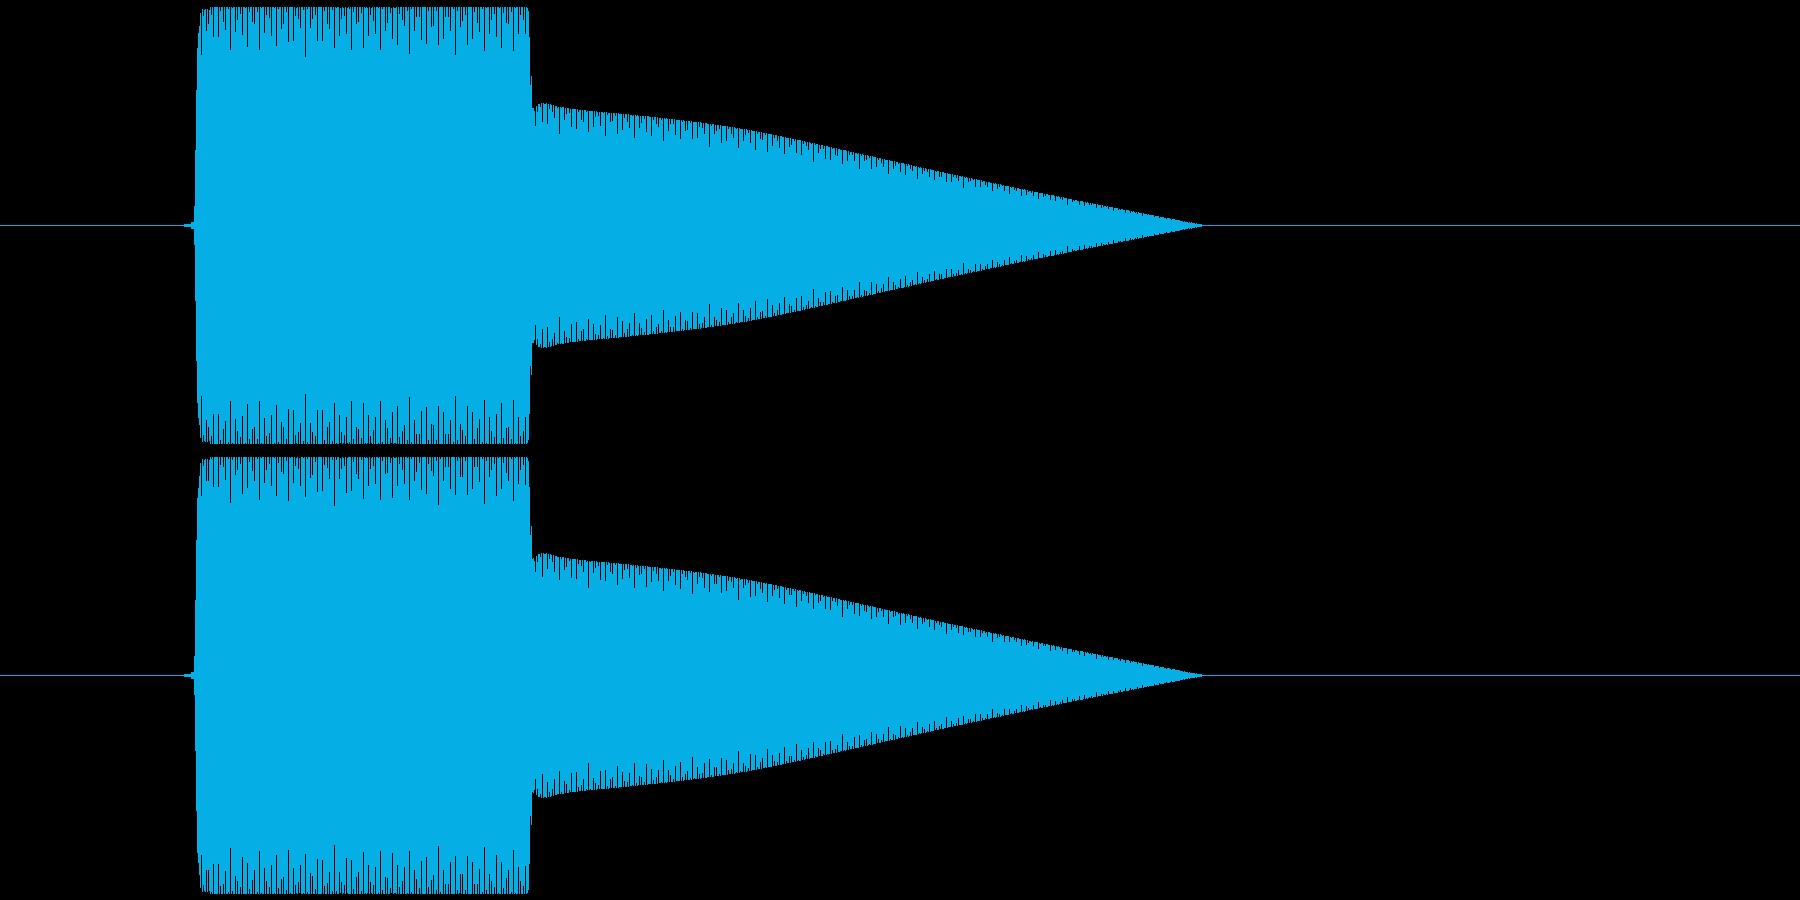 528Hzのボタン音 ヒーリングの再生済みの波形